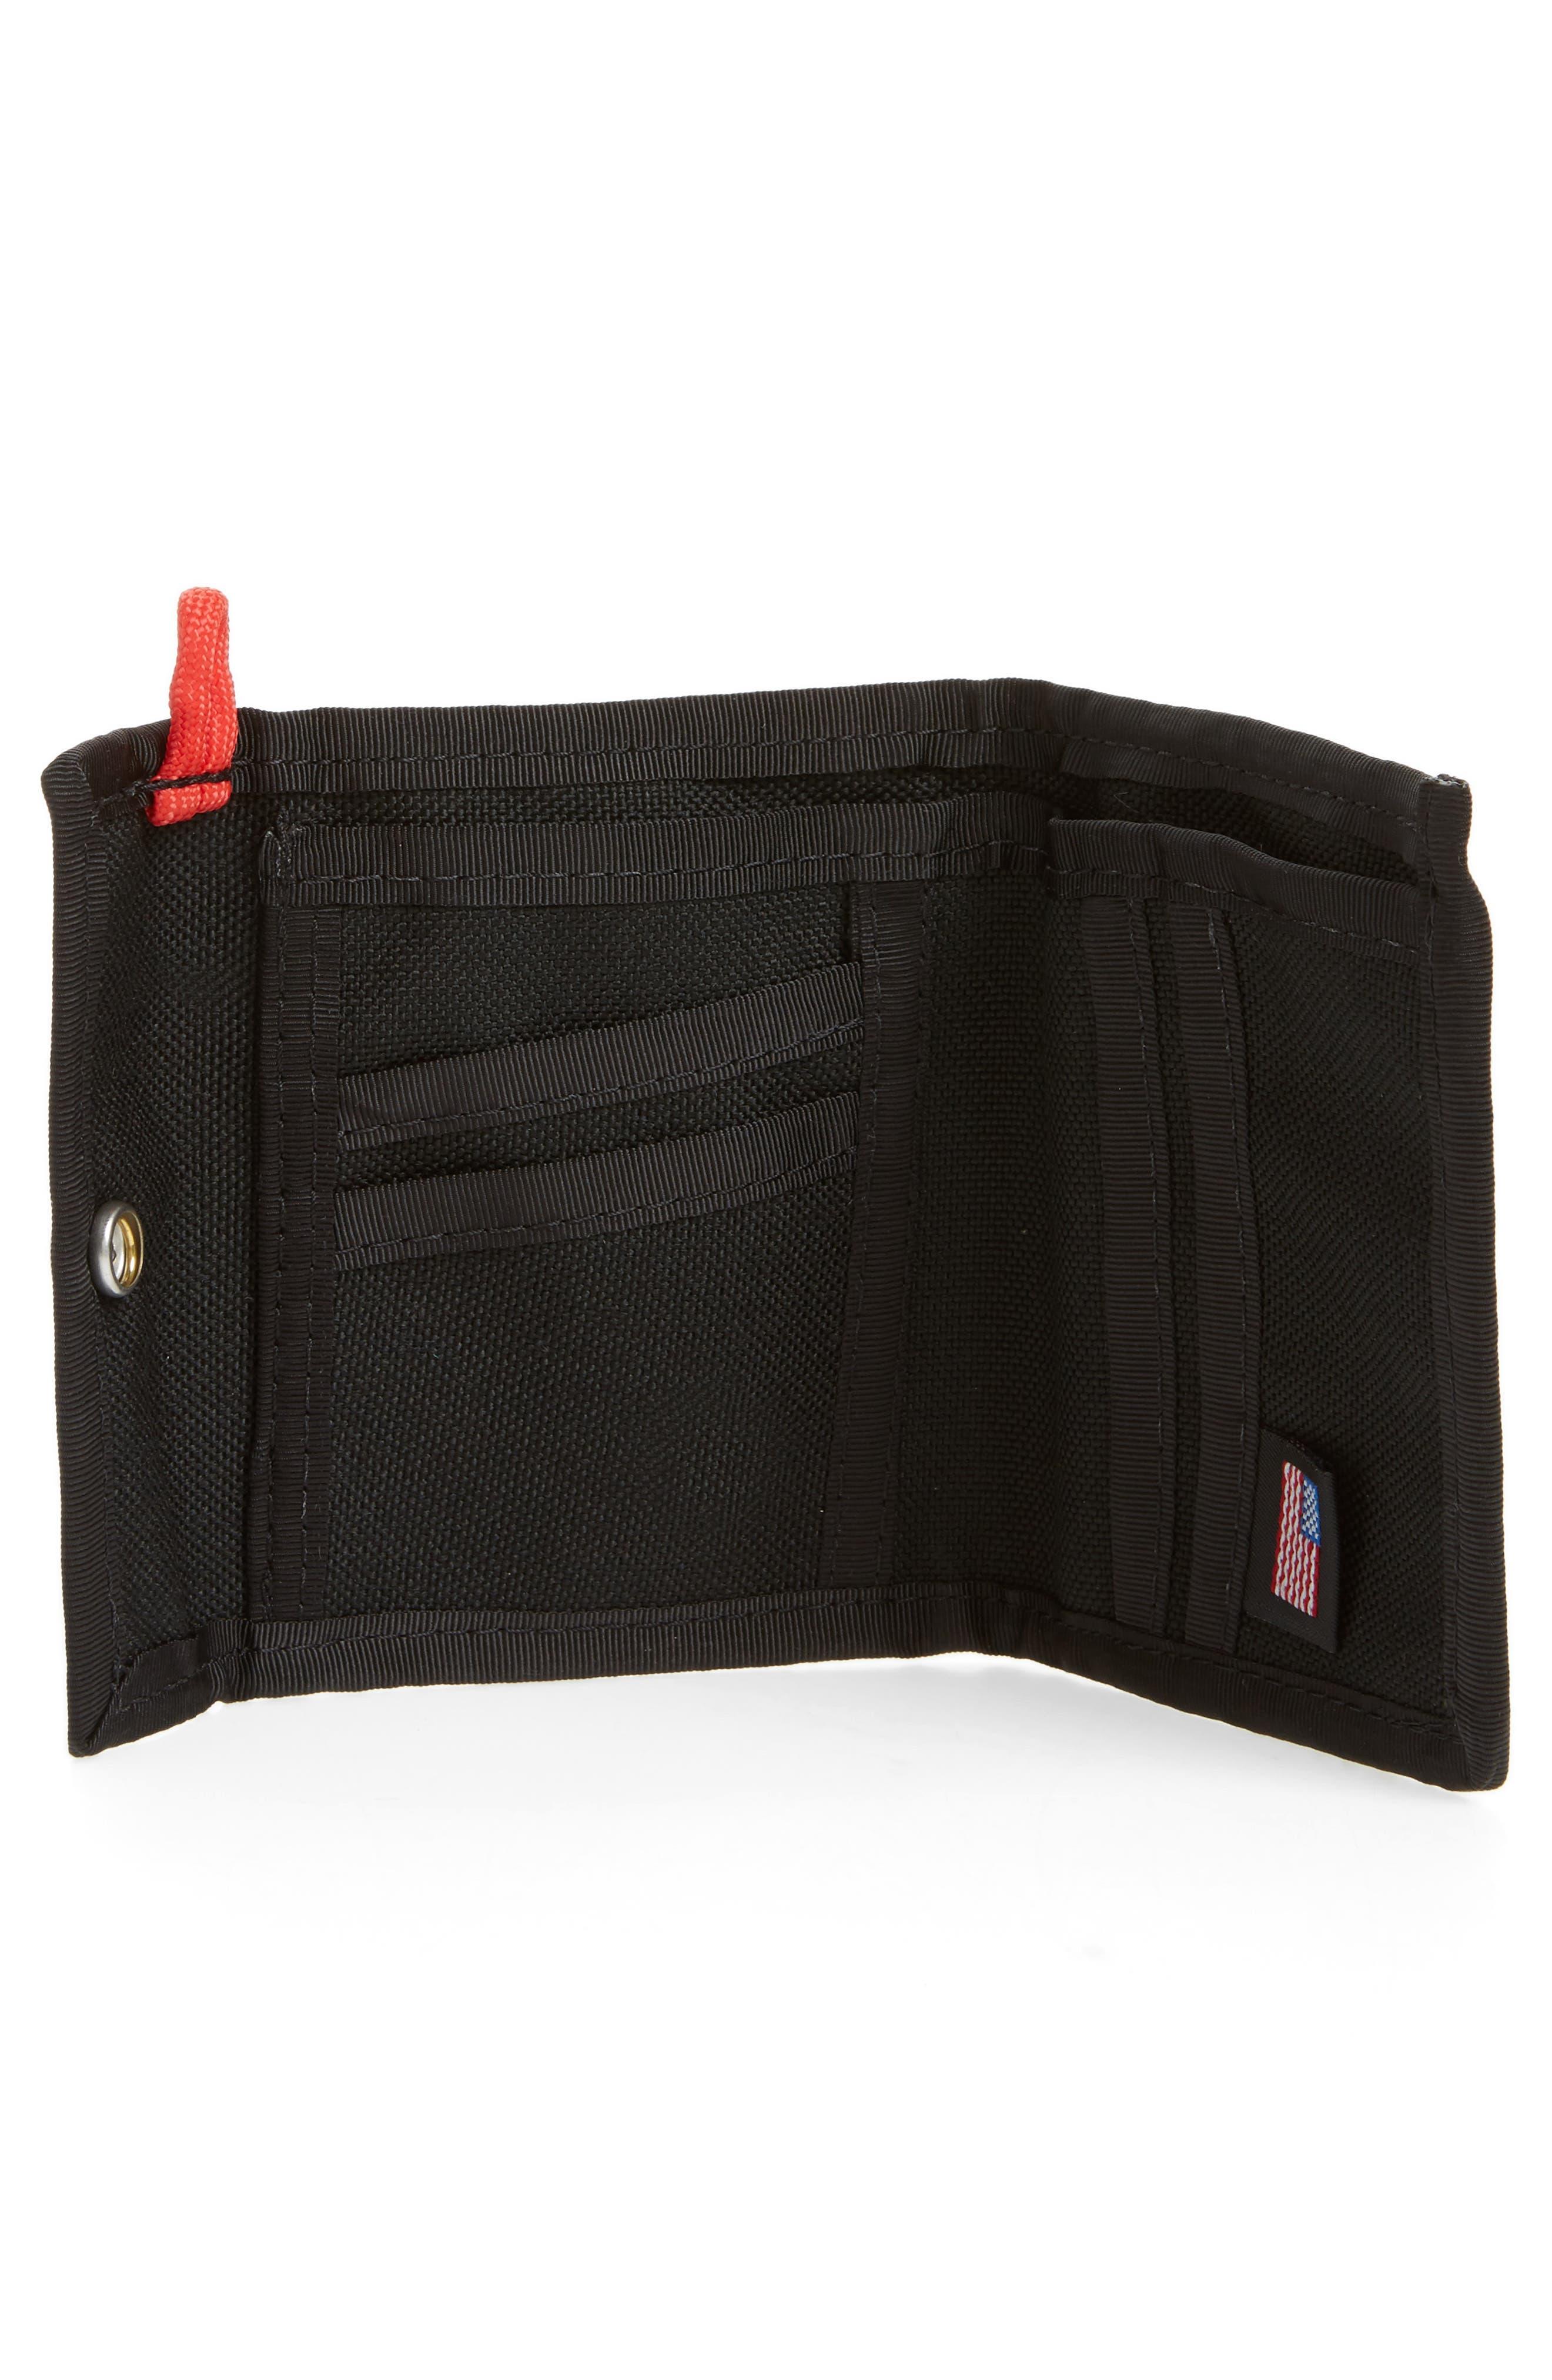 Snap Wallet,                             Alternate thumbnail 2, color,                             BLACK